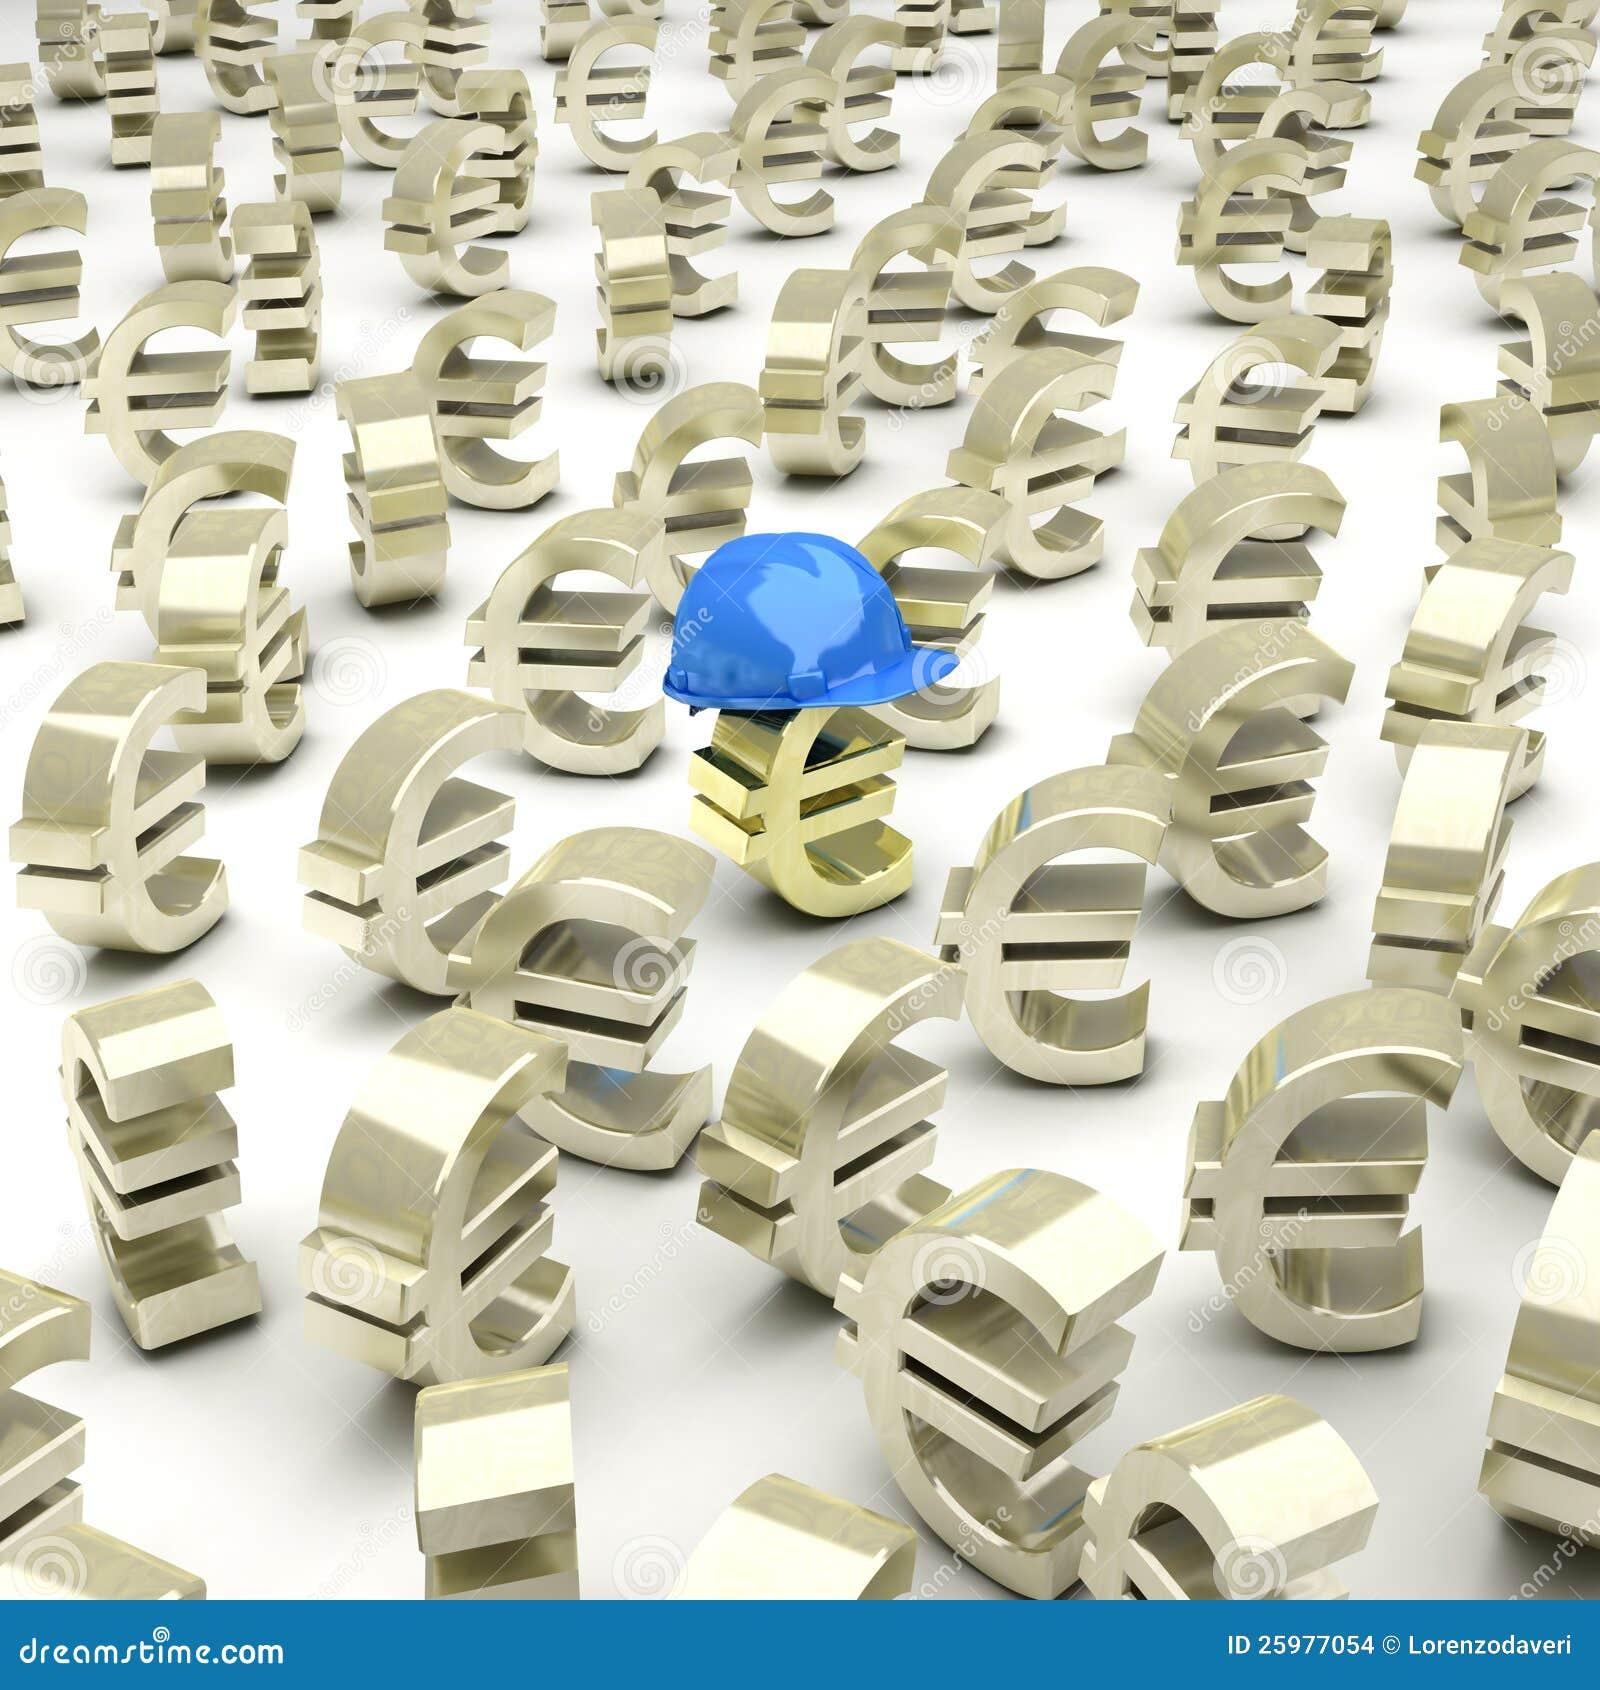 Euro unprotected